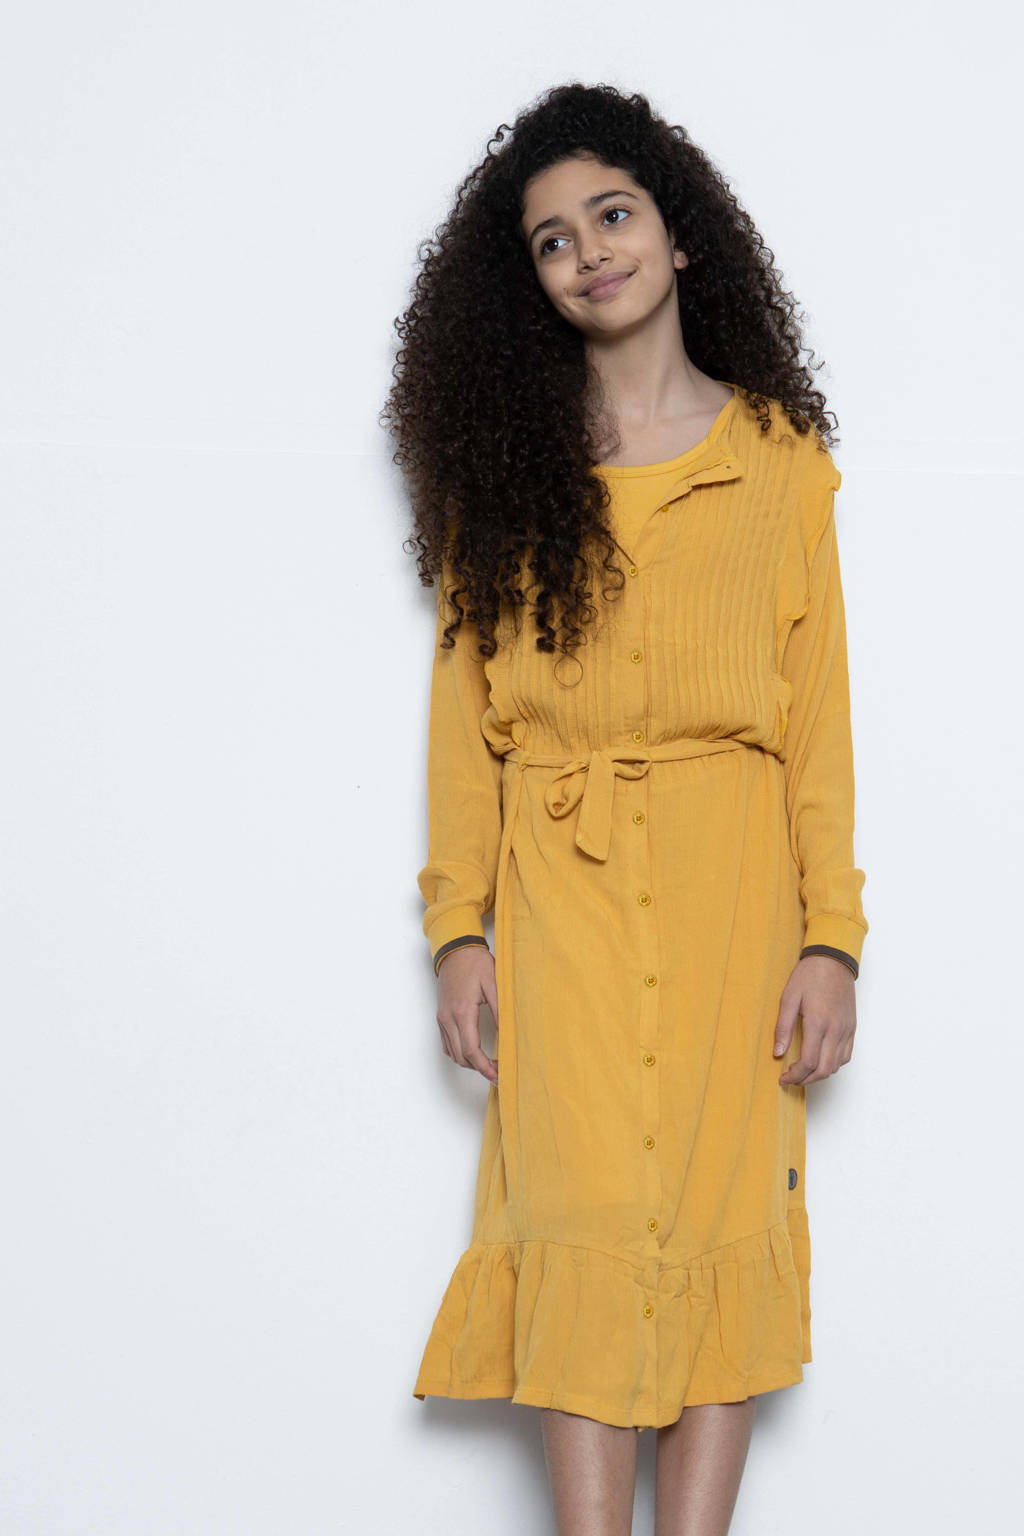 LEVV Girls blousejurk Maaike met ruches okergeel, Okergeel